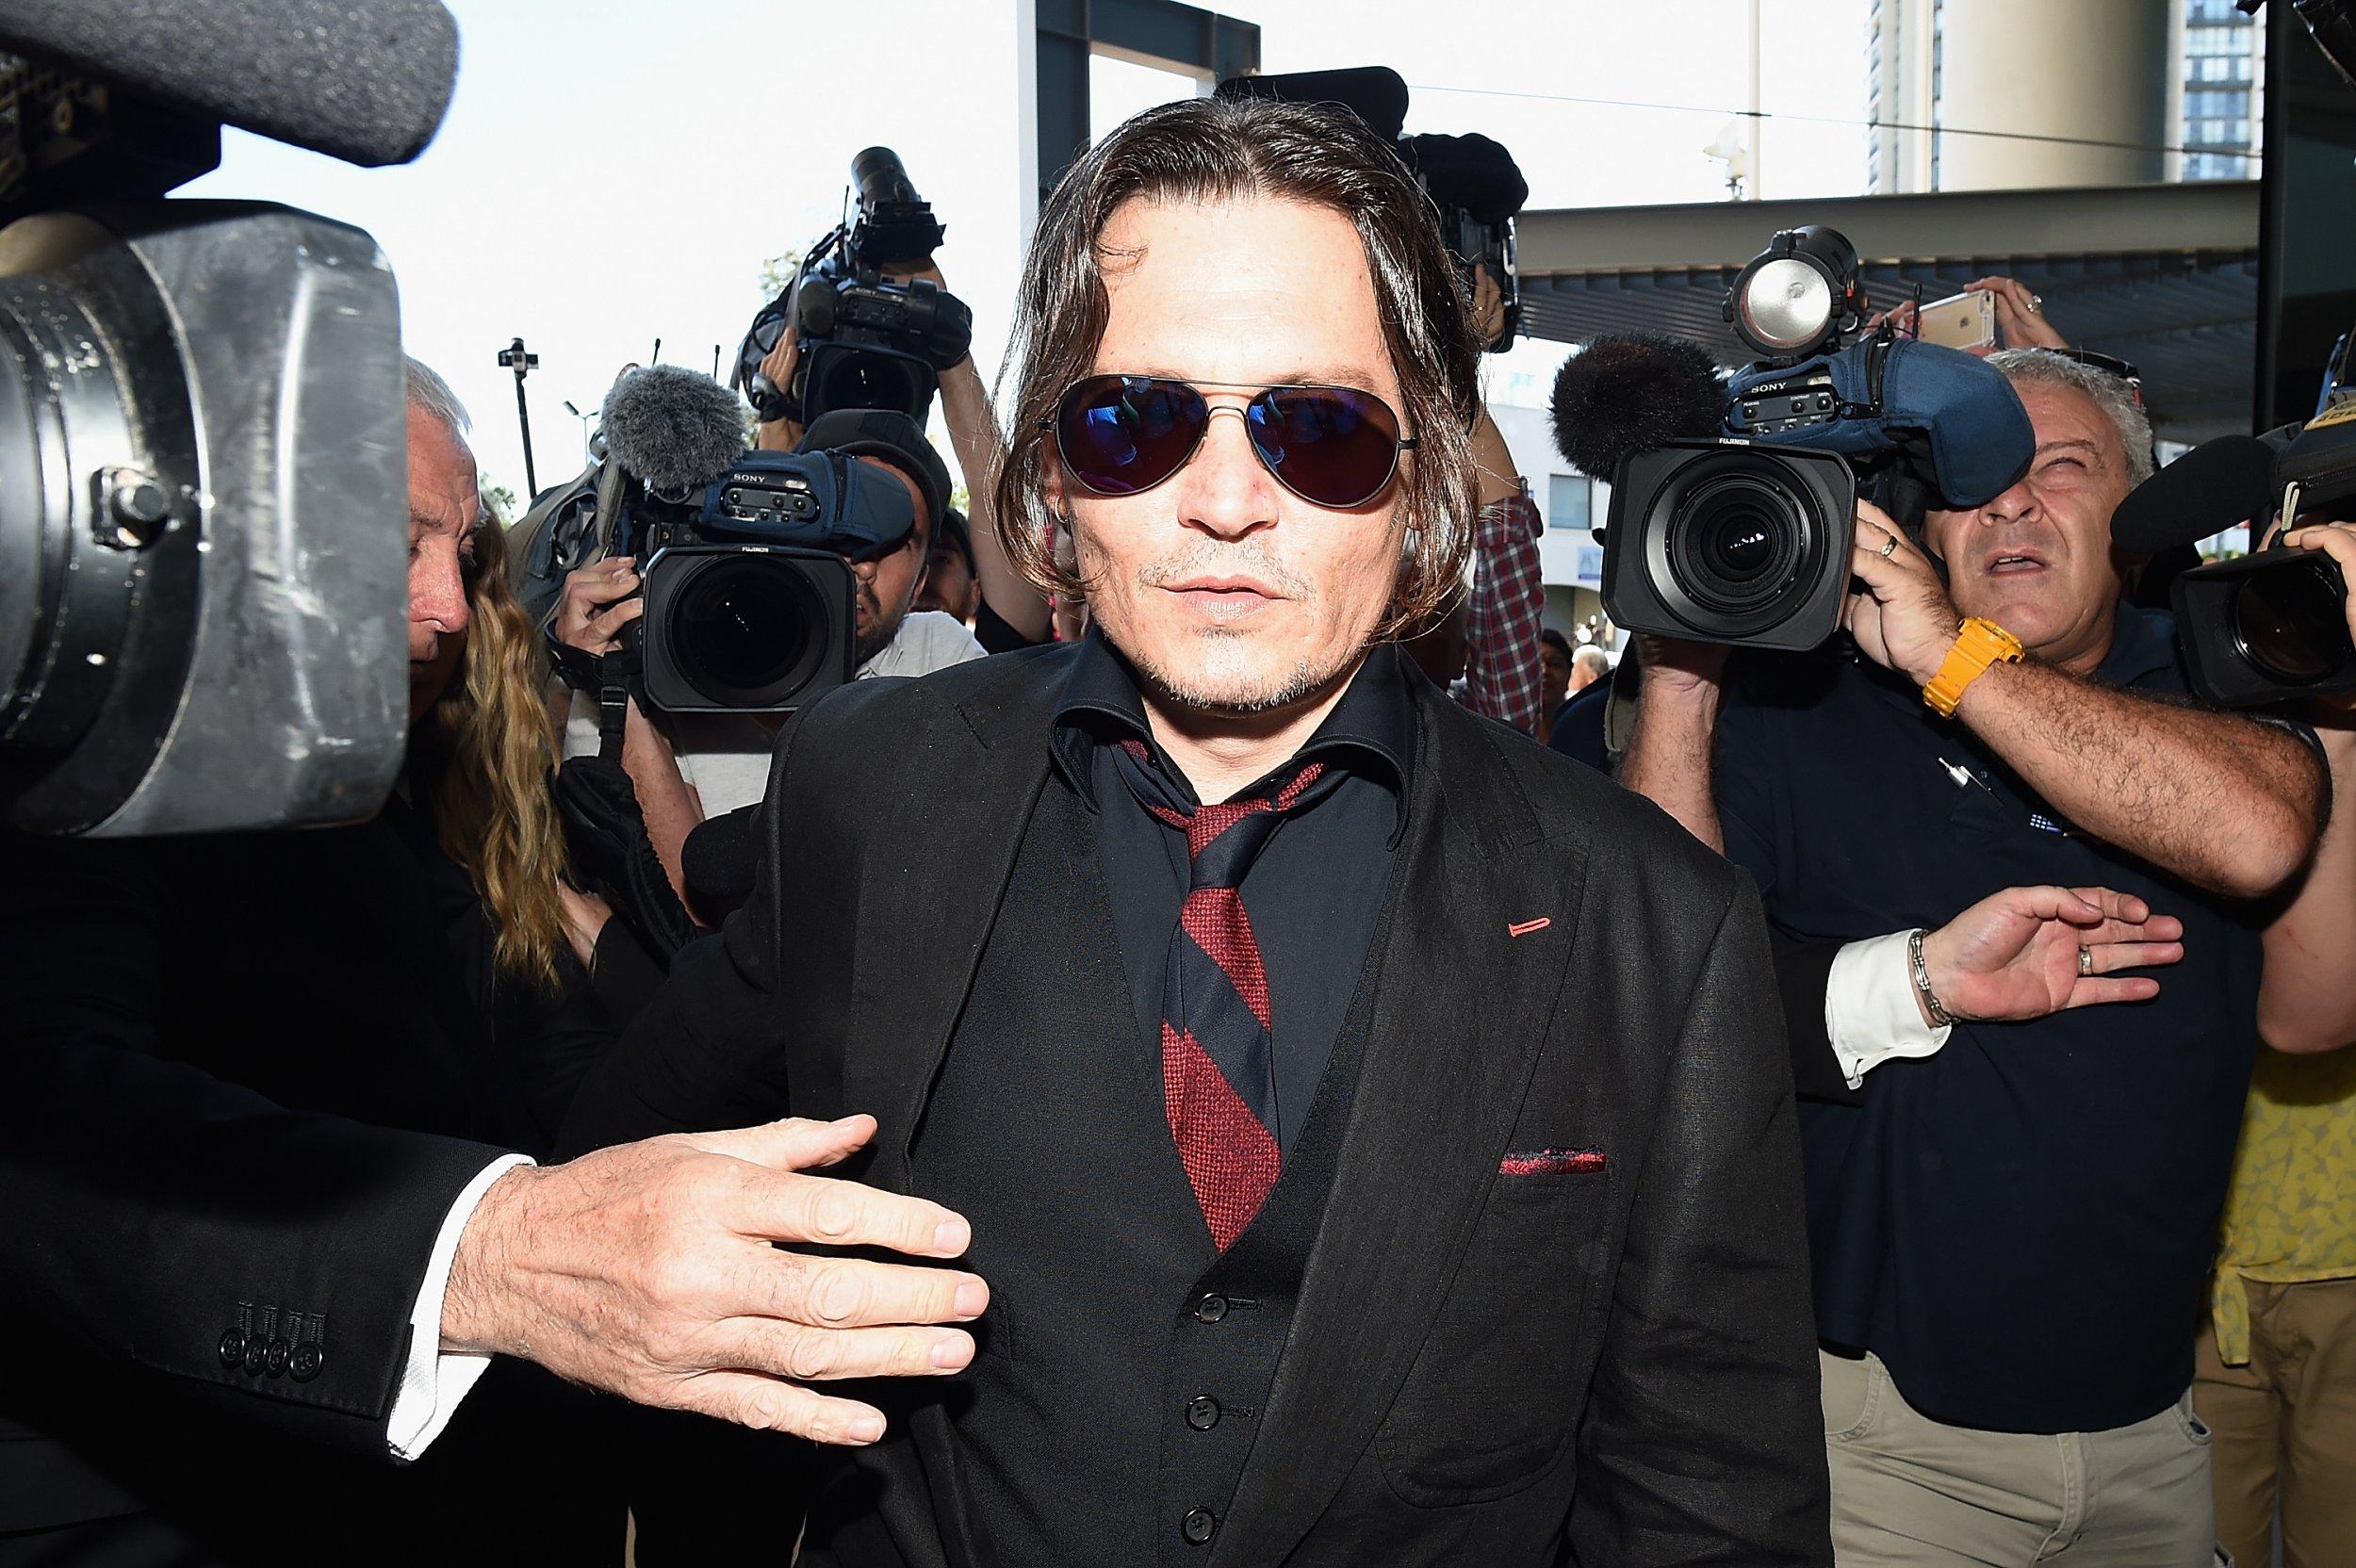 Johnny Depp arriving at court in Australia.